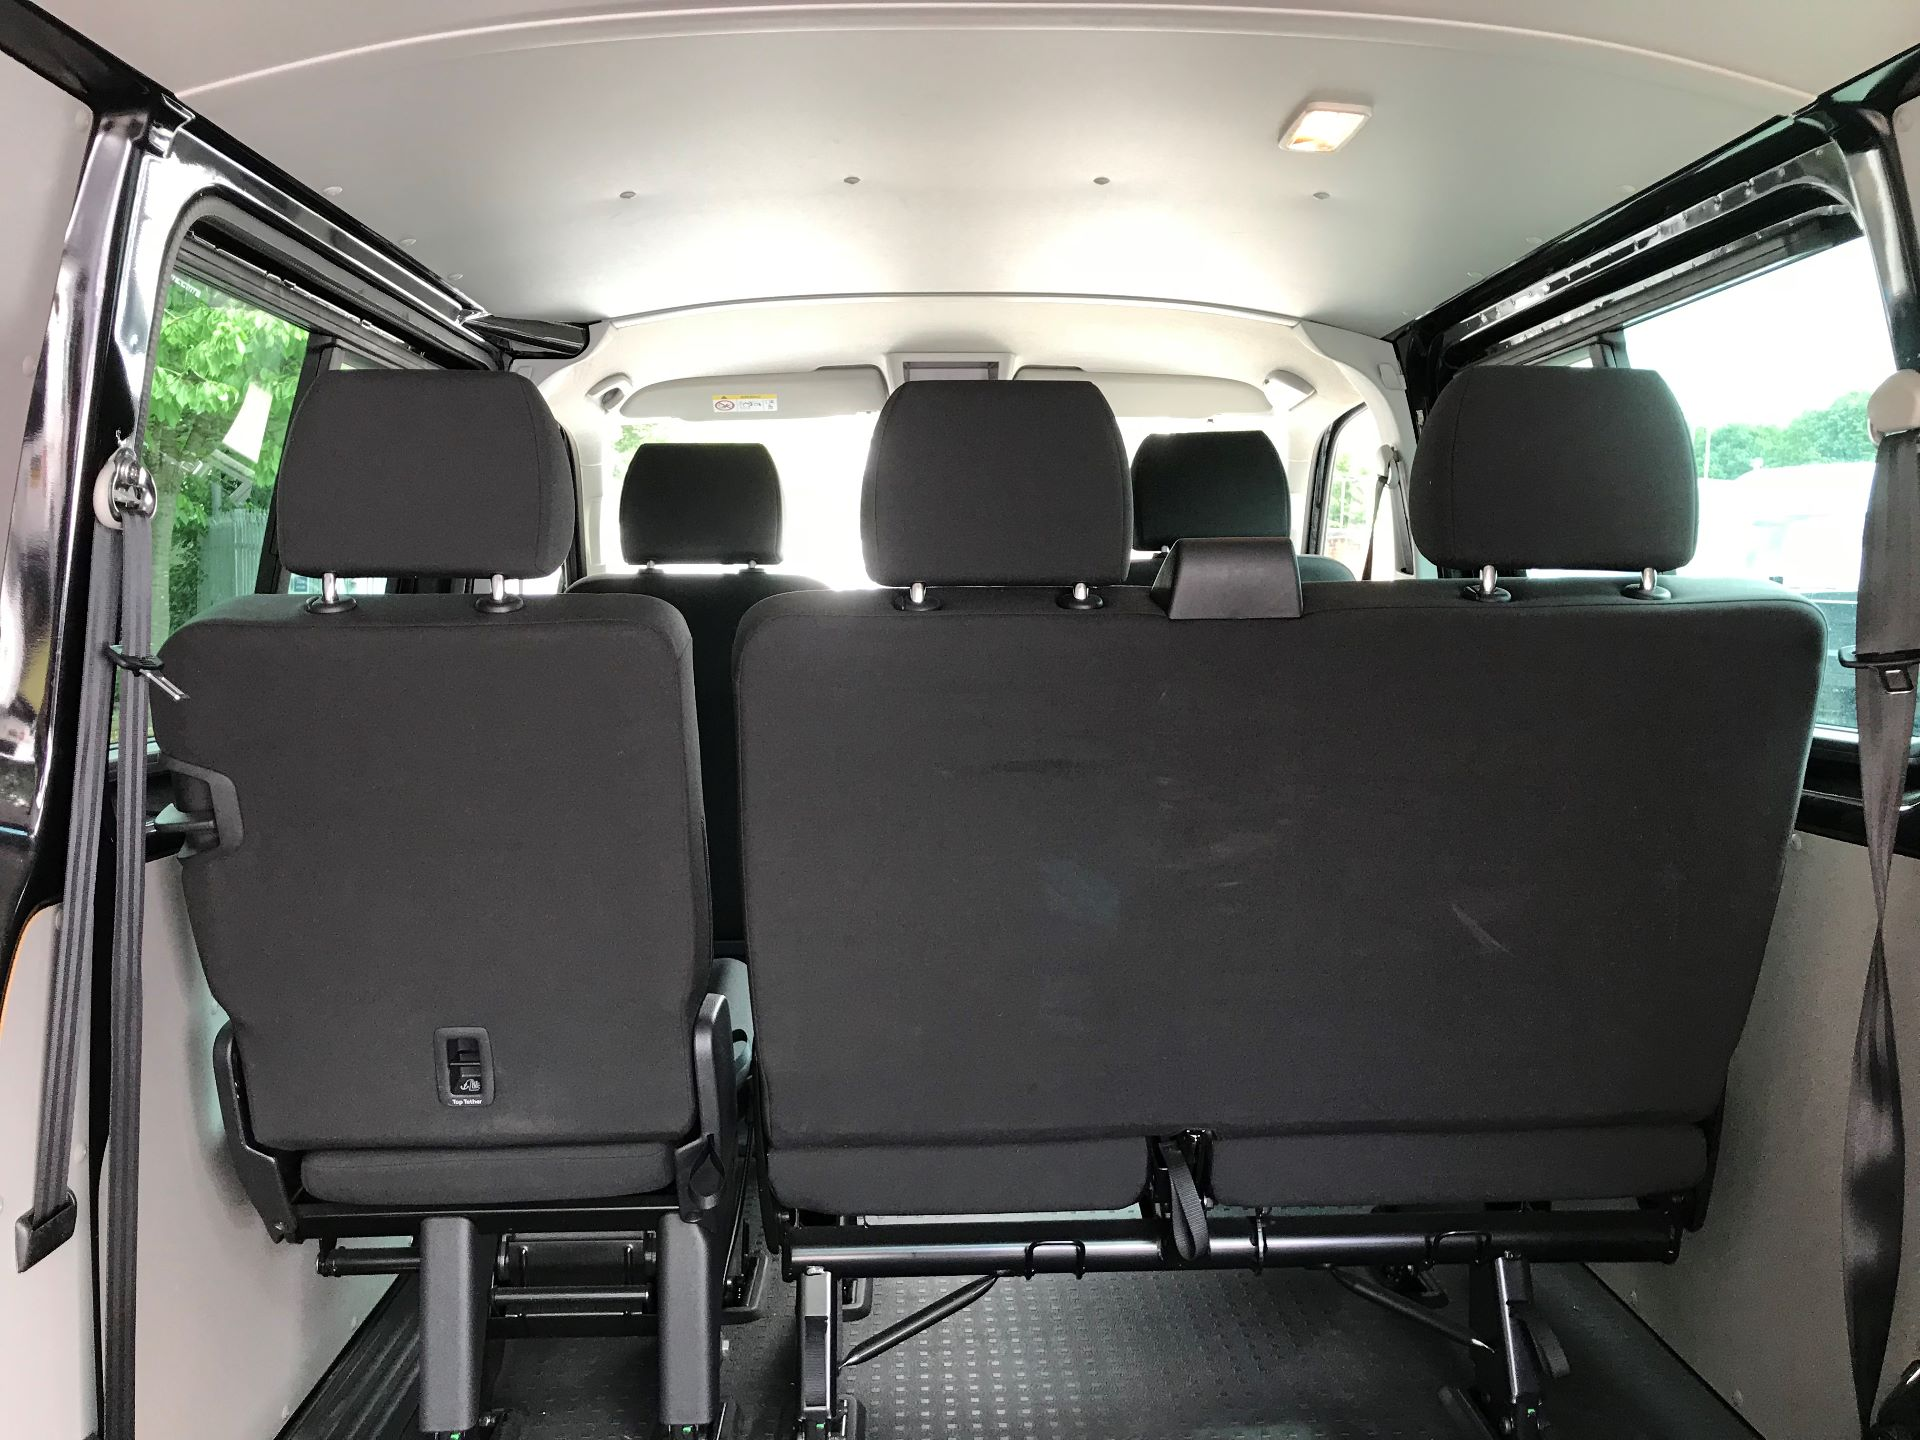 2018 Volkswagen Transporter 2.0 Tdi Bmt 150 Highline Kombi Van Dsg euro 6 (GU18FHR) Image 11